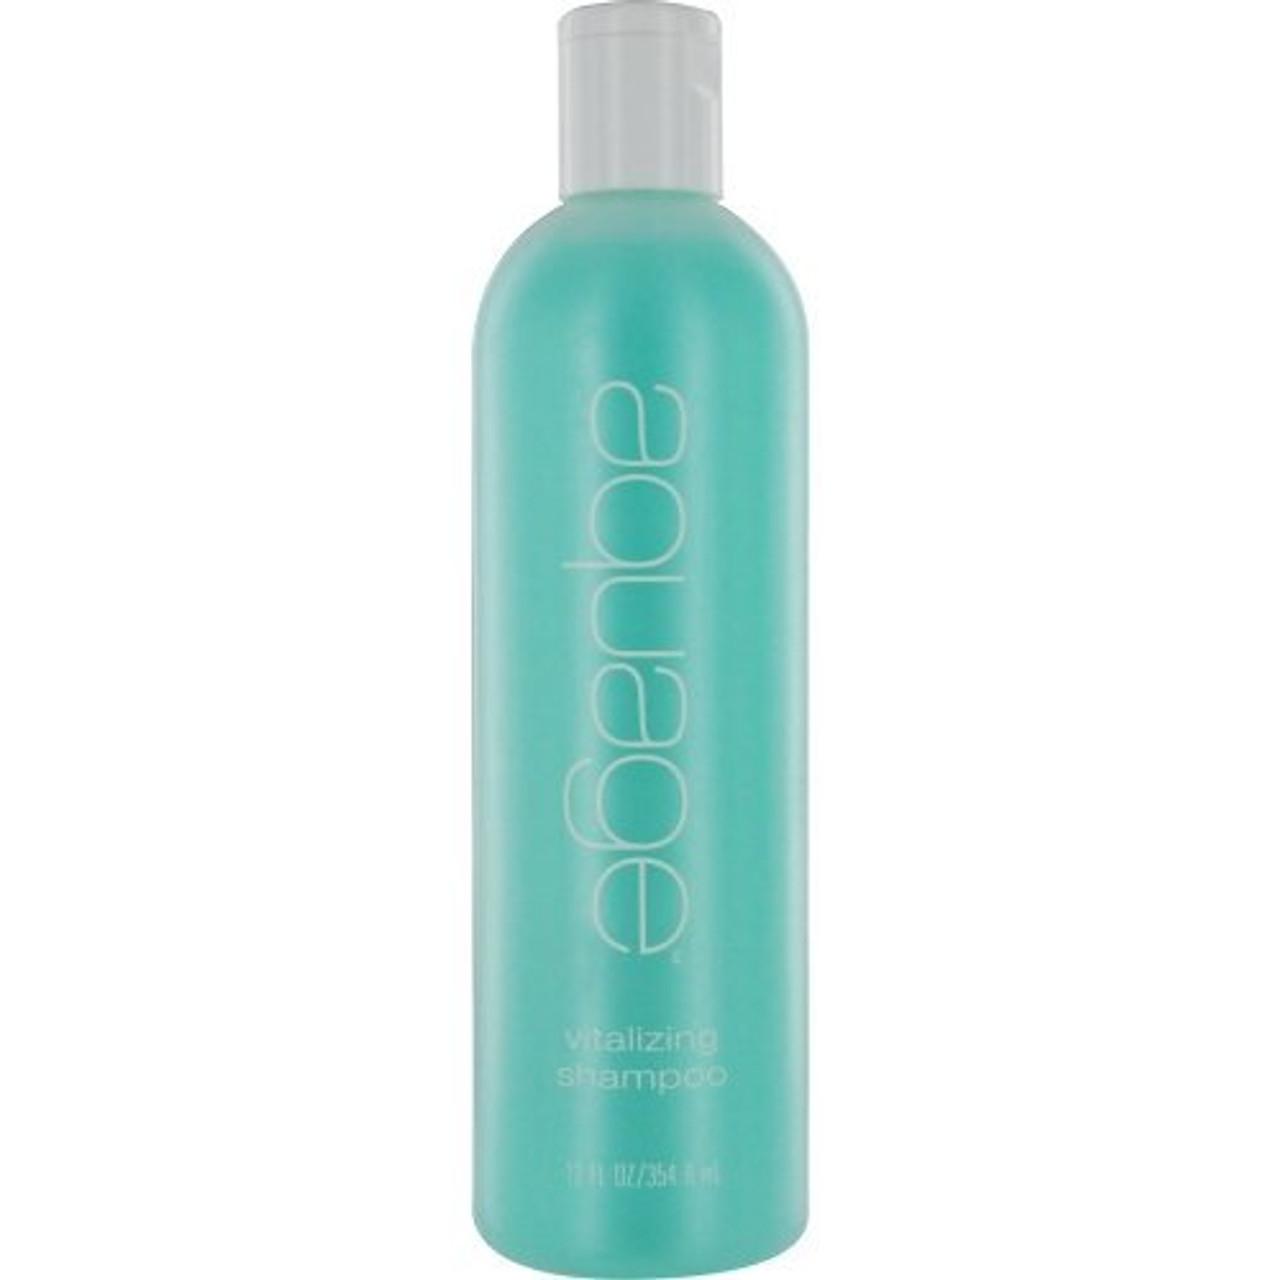 Aquage Vitalizing Shampoo, 12 oz